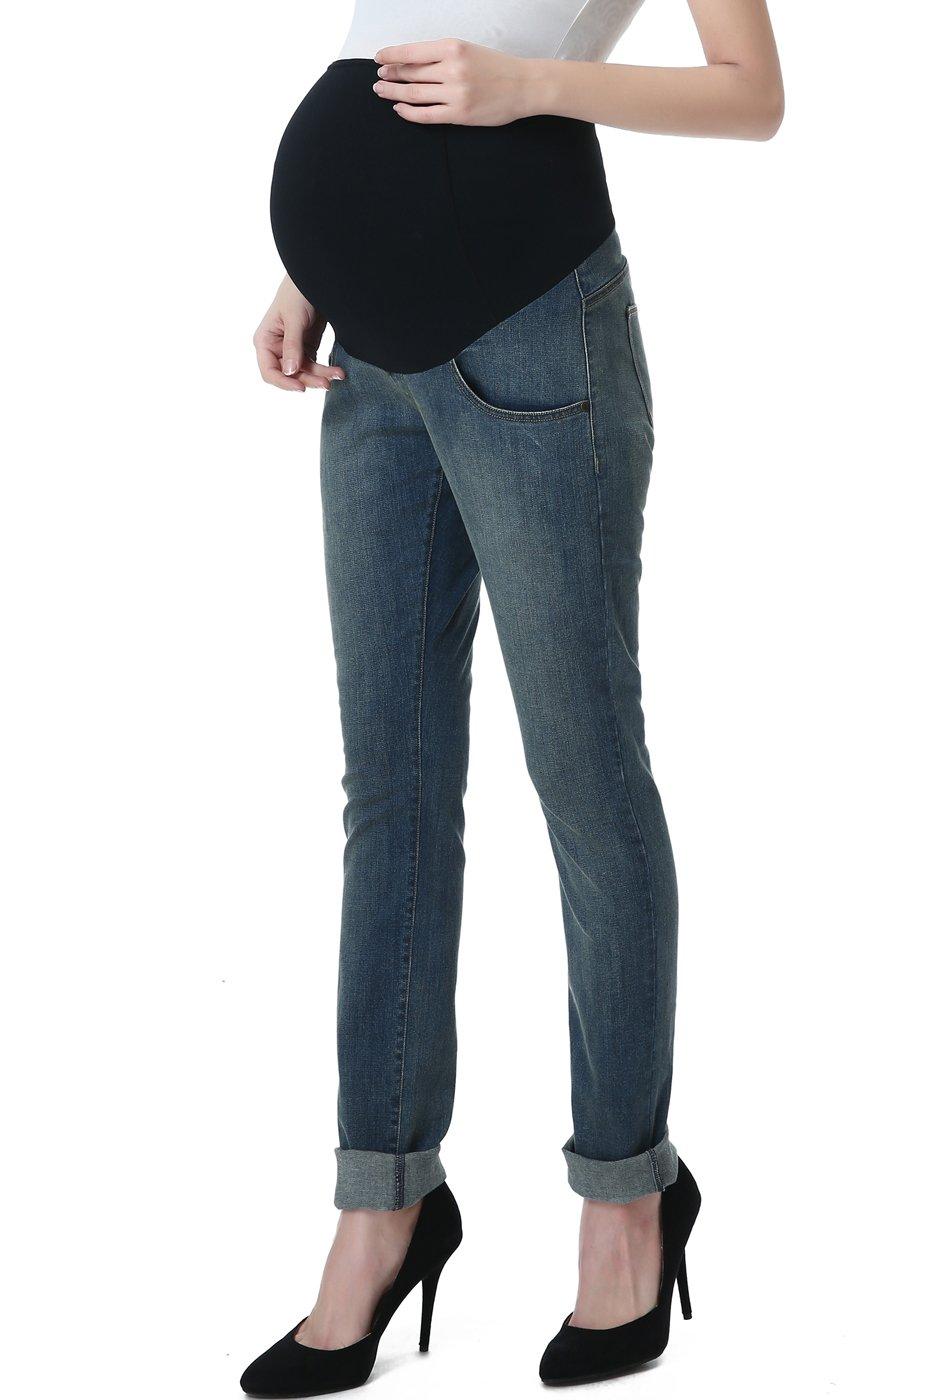 Momo Maternity Women's Straight Leg Denim Jeans - Medium Indigo 32